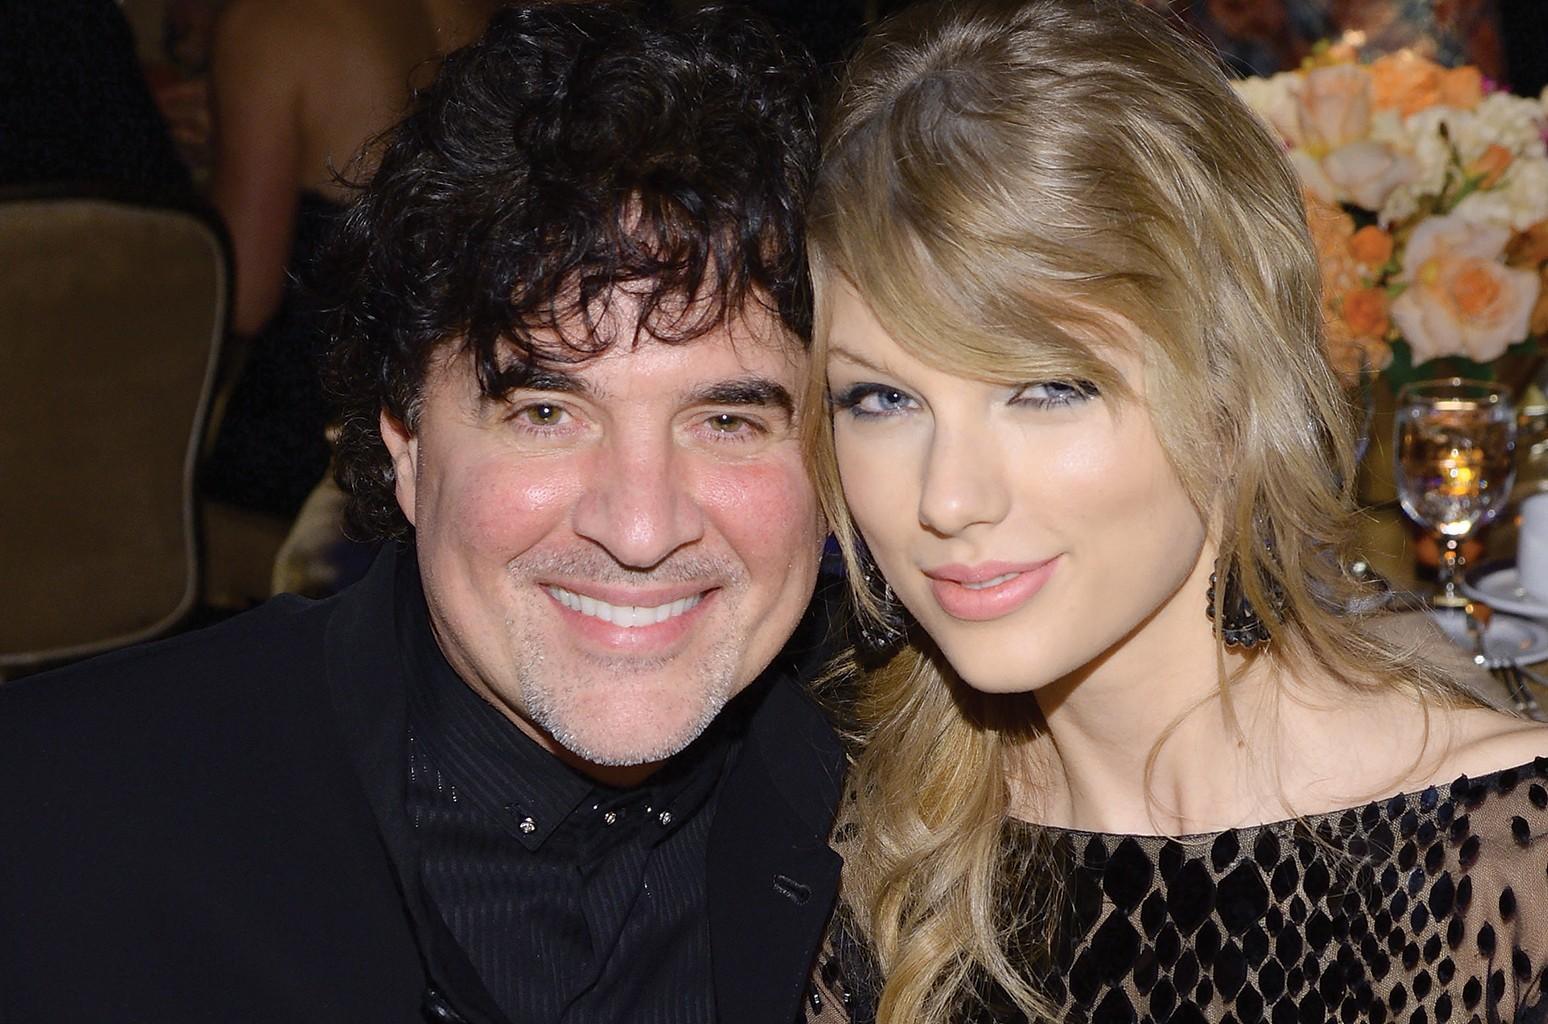 Scott Borchetta and Taylor Swift